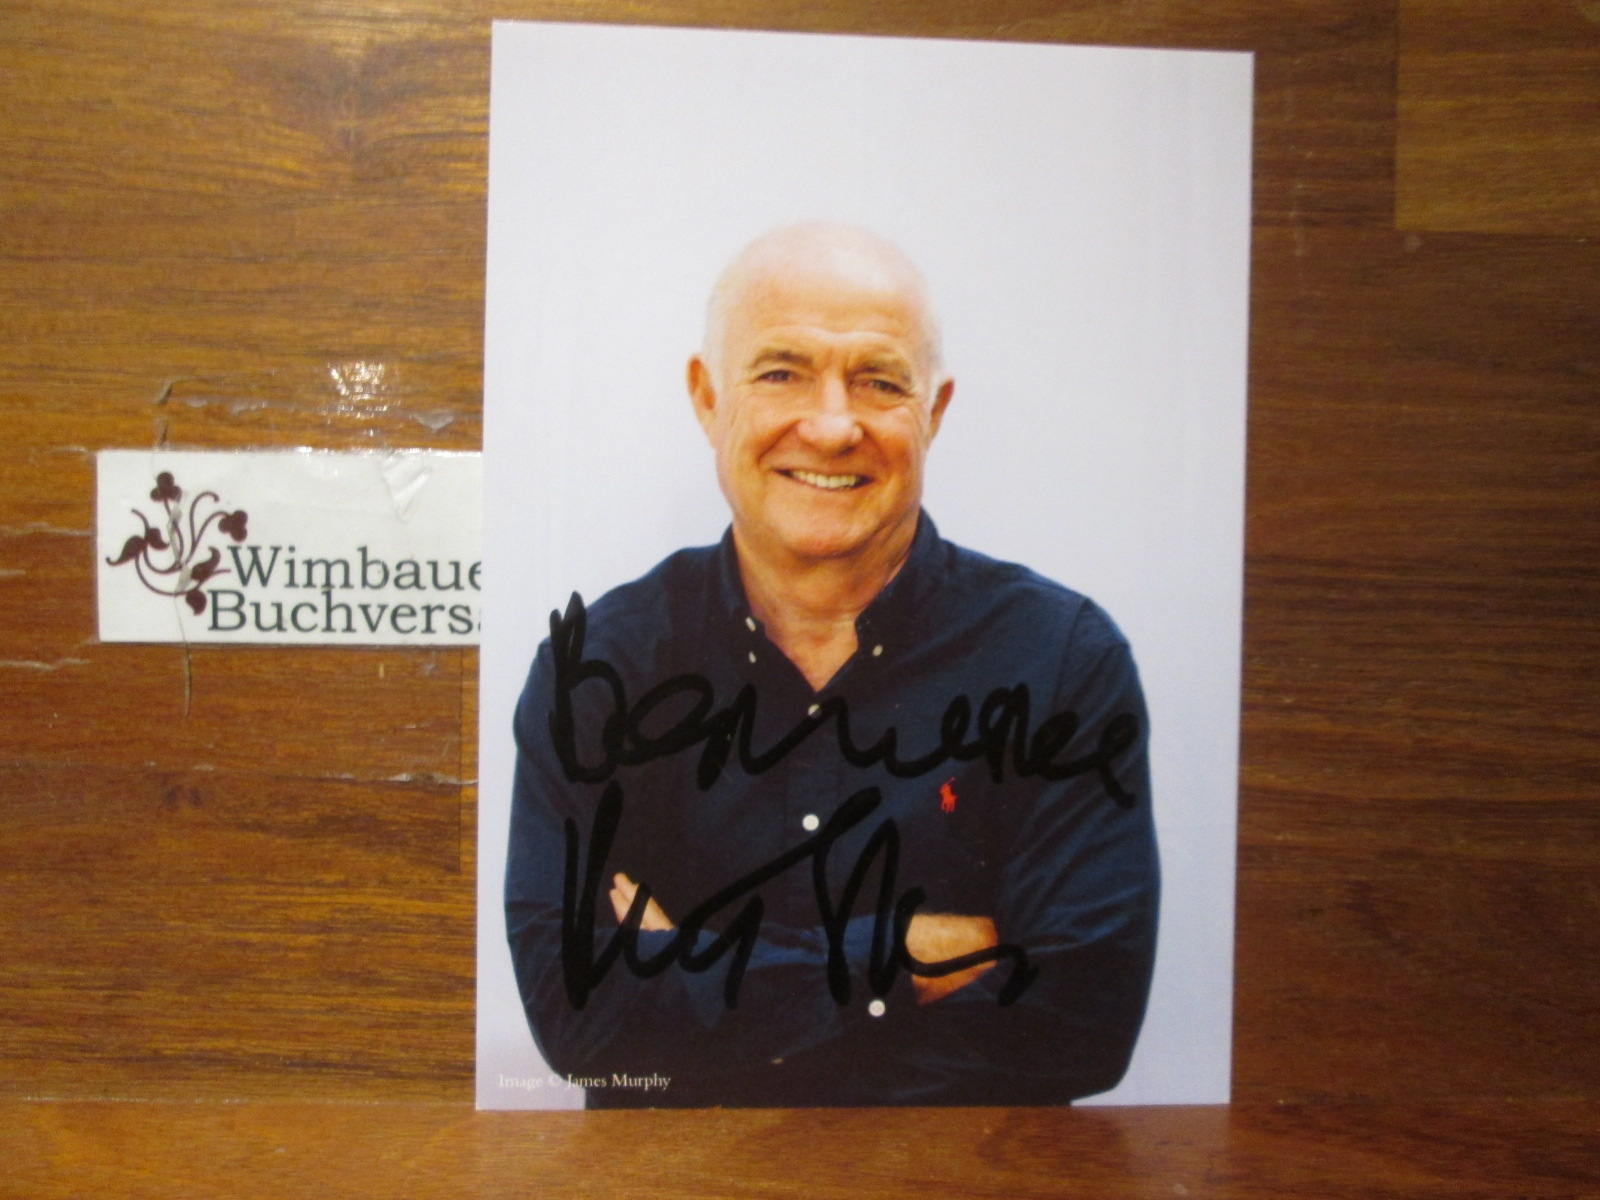 Original Autograph Rick Stein Celebrity Chef Starkoch /// Autogramm Autograph signiert signed signee